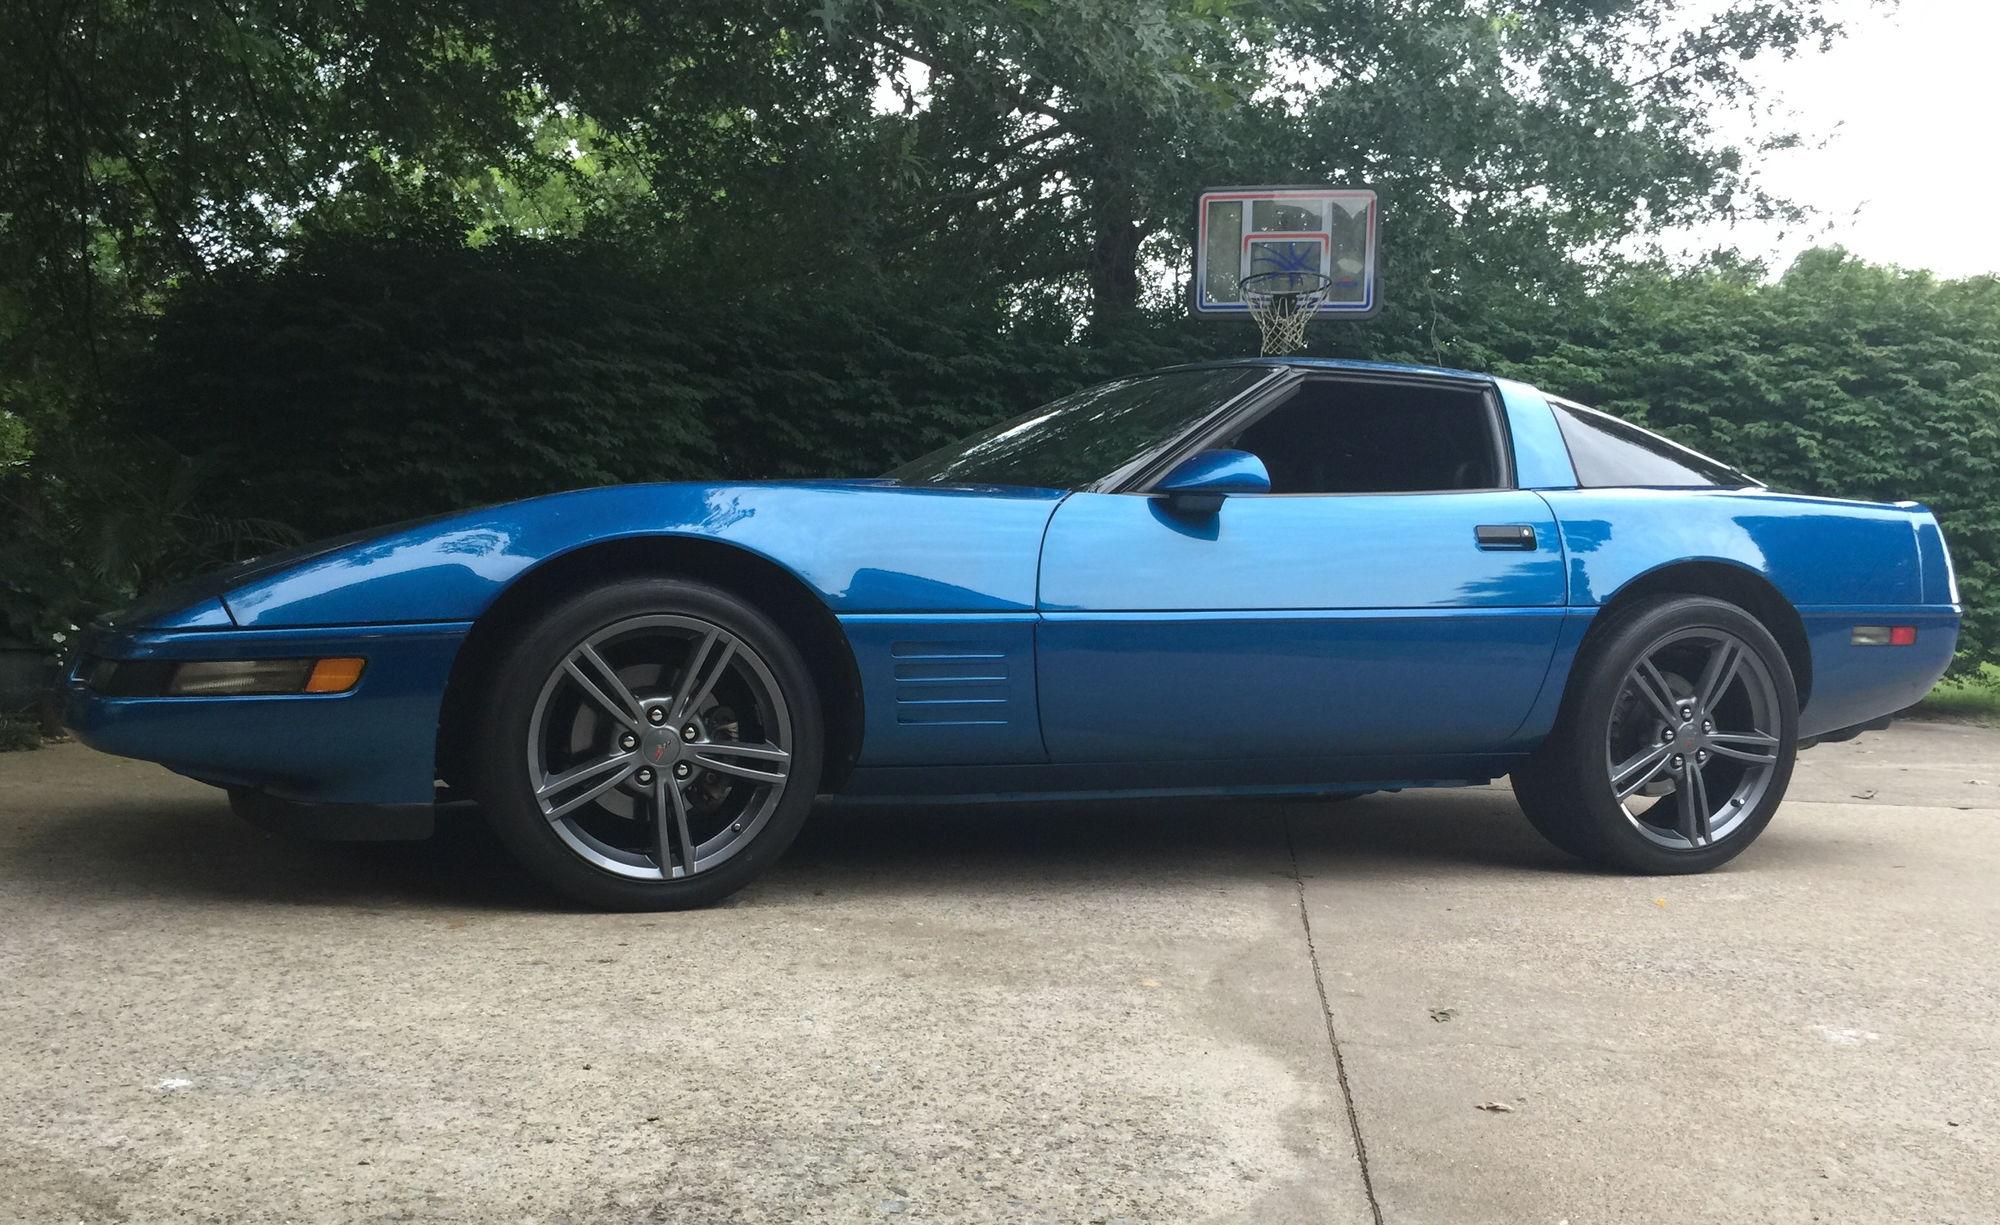 C5 Wheels On C4 18 19 Quot Staggered Corvetteforum